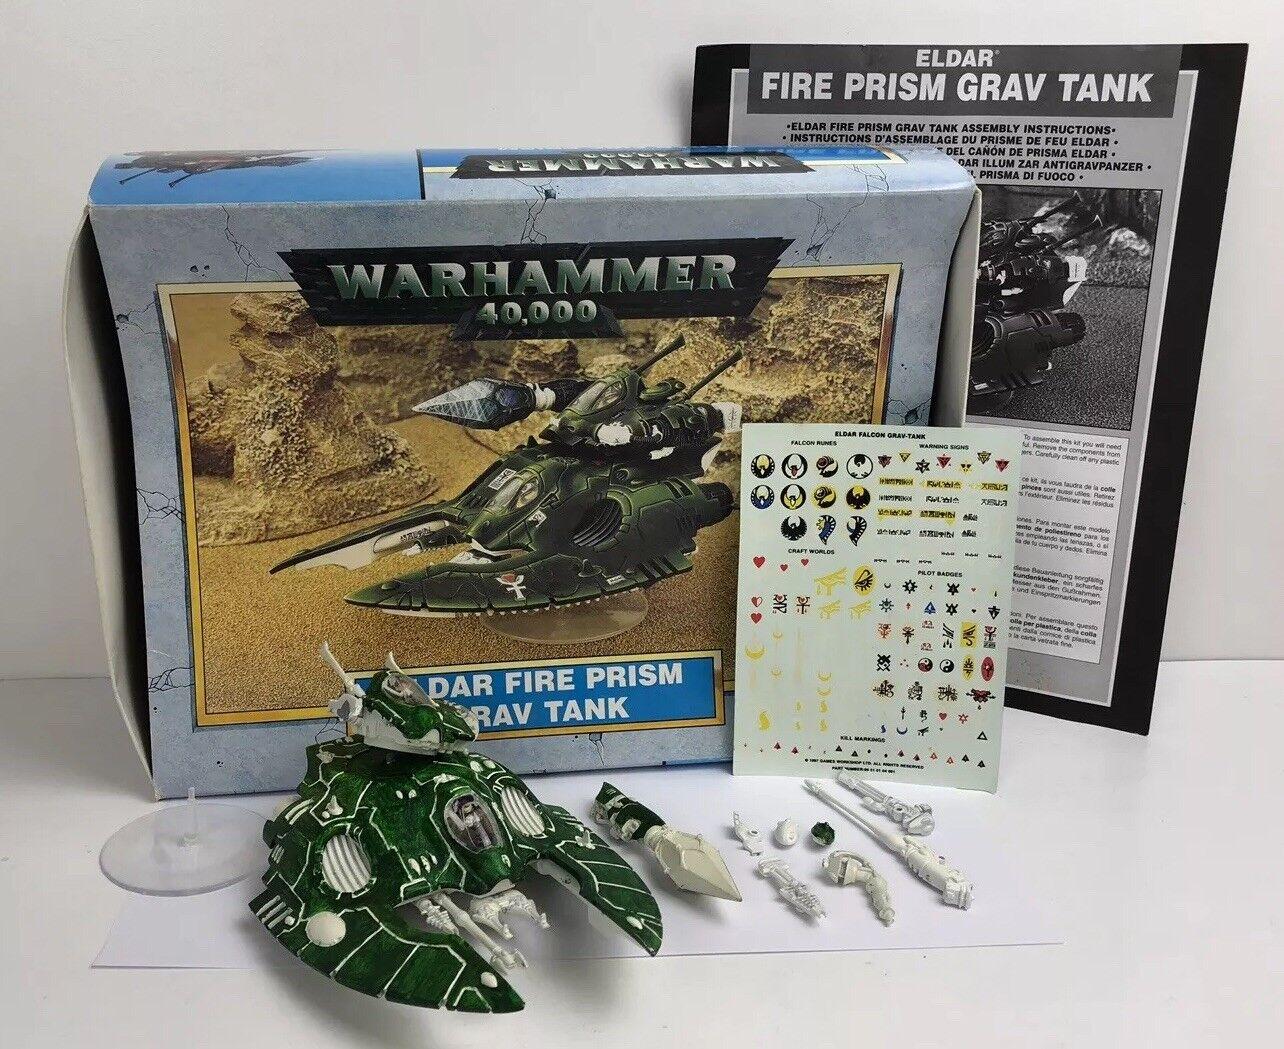 Warhammer 40K Eldar Fire Prism Grav Tank Boxed